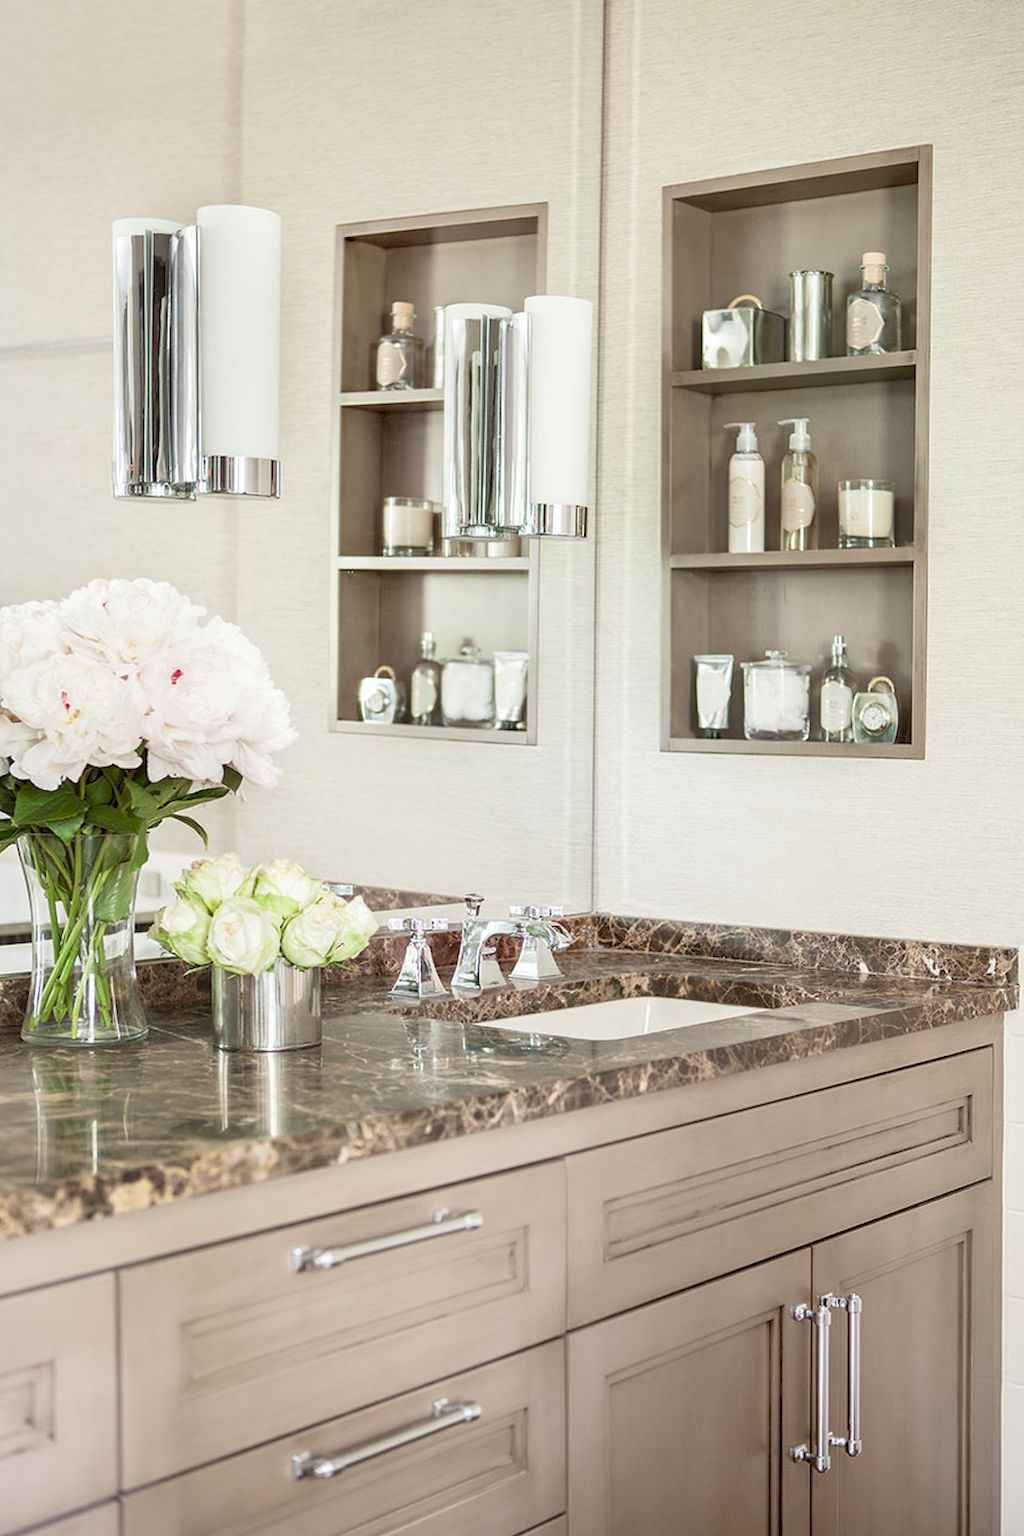 Cool bathroom storage shelves organization ideas (6)